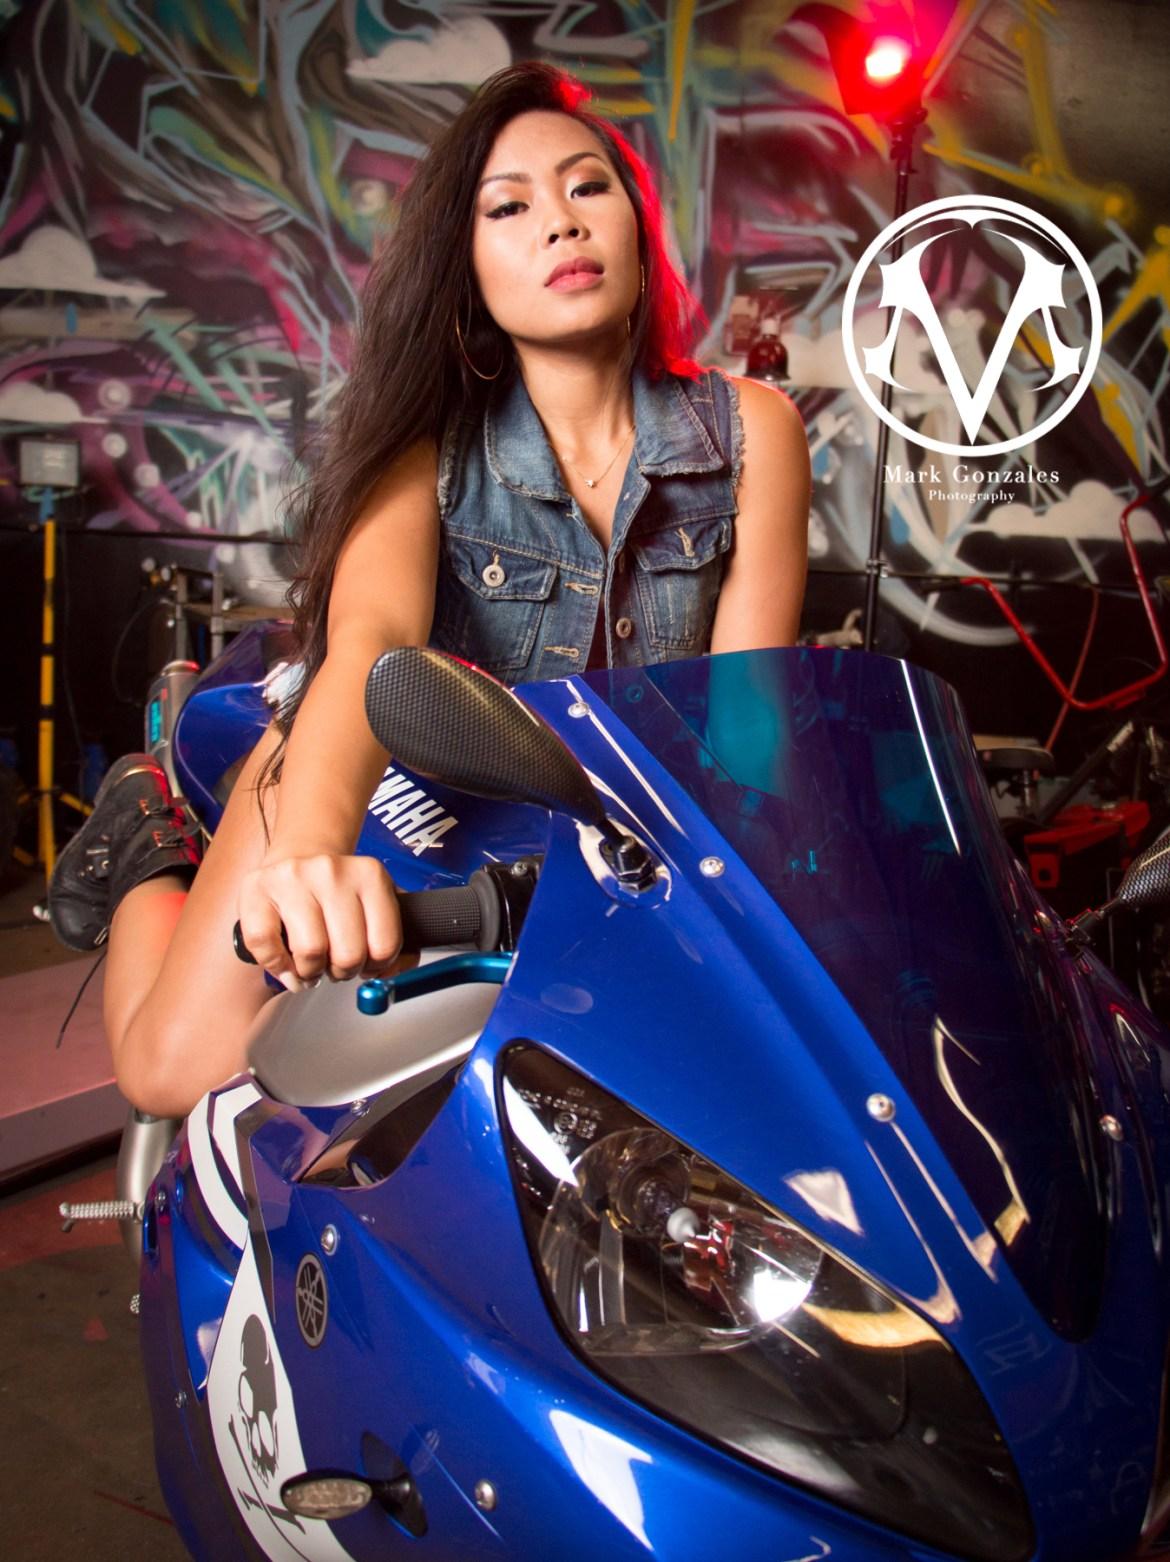 Chanel Li - 06/19/2015